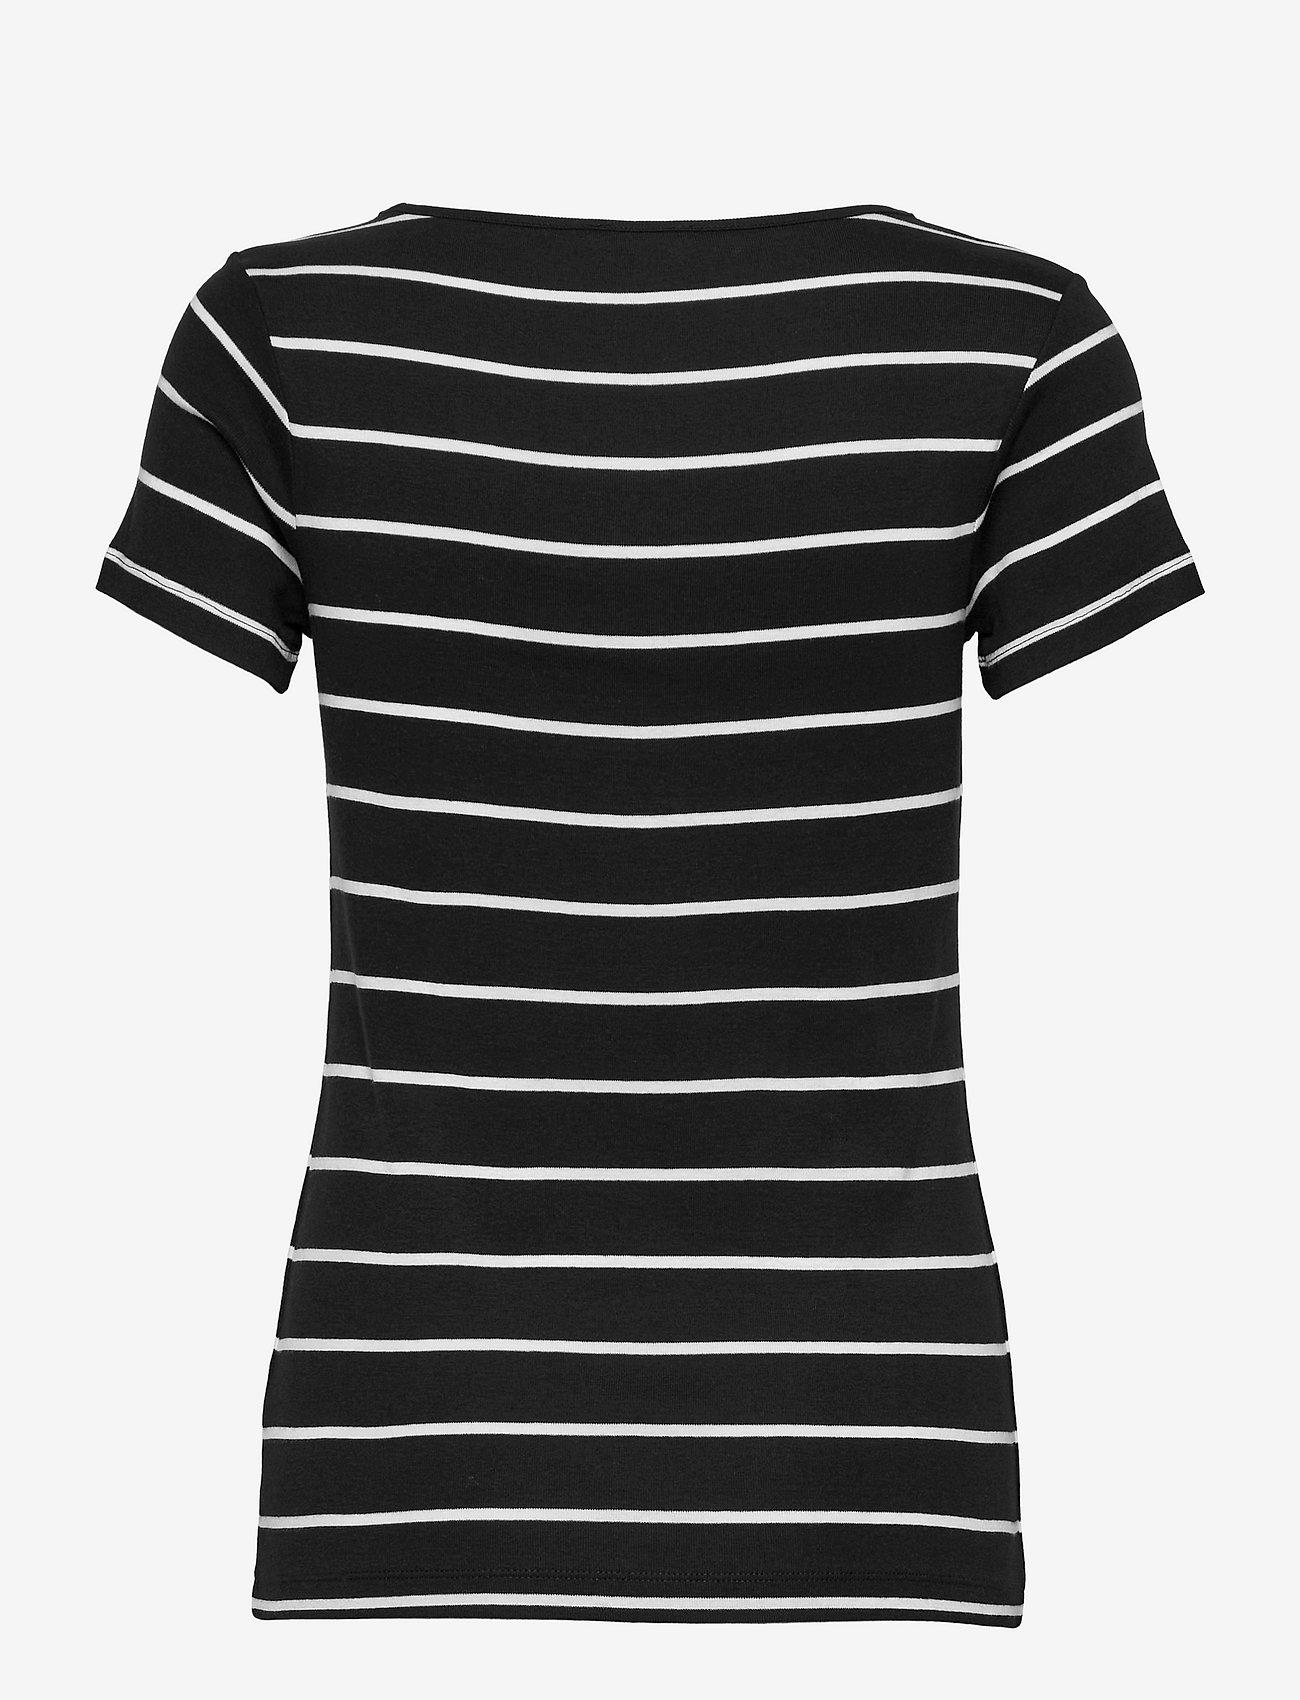 EDC by Esprit - T-Shirts - t-shirts - black - 1